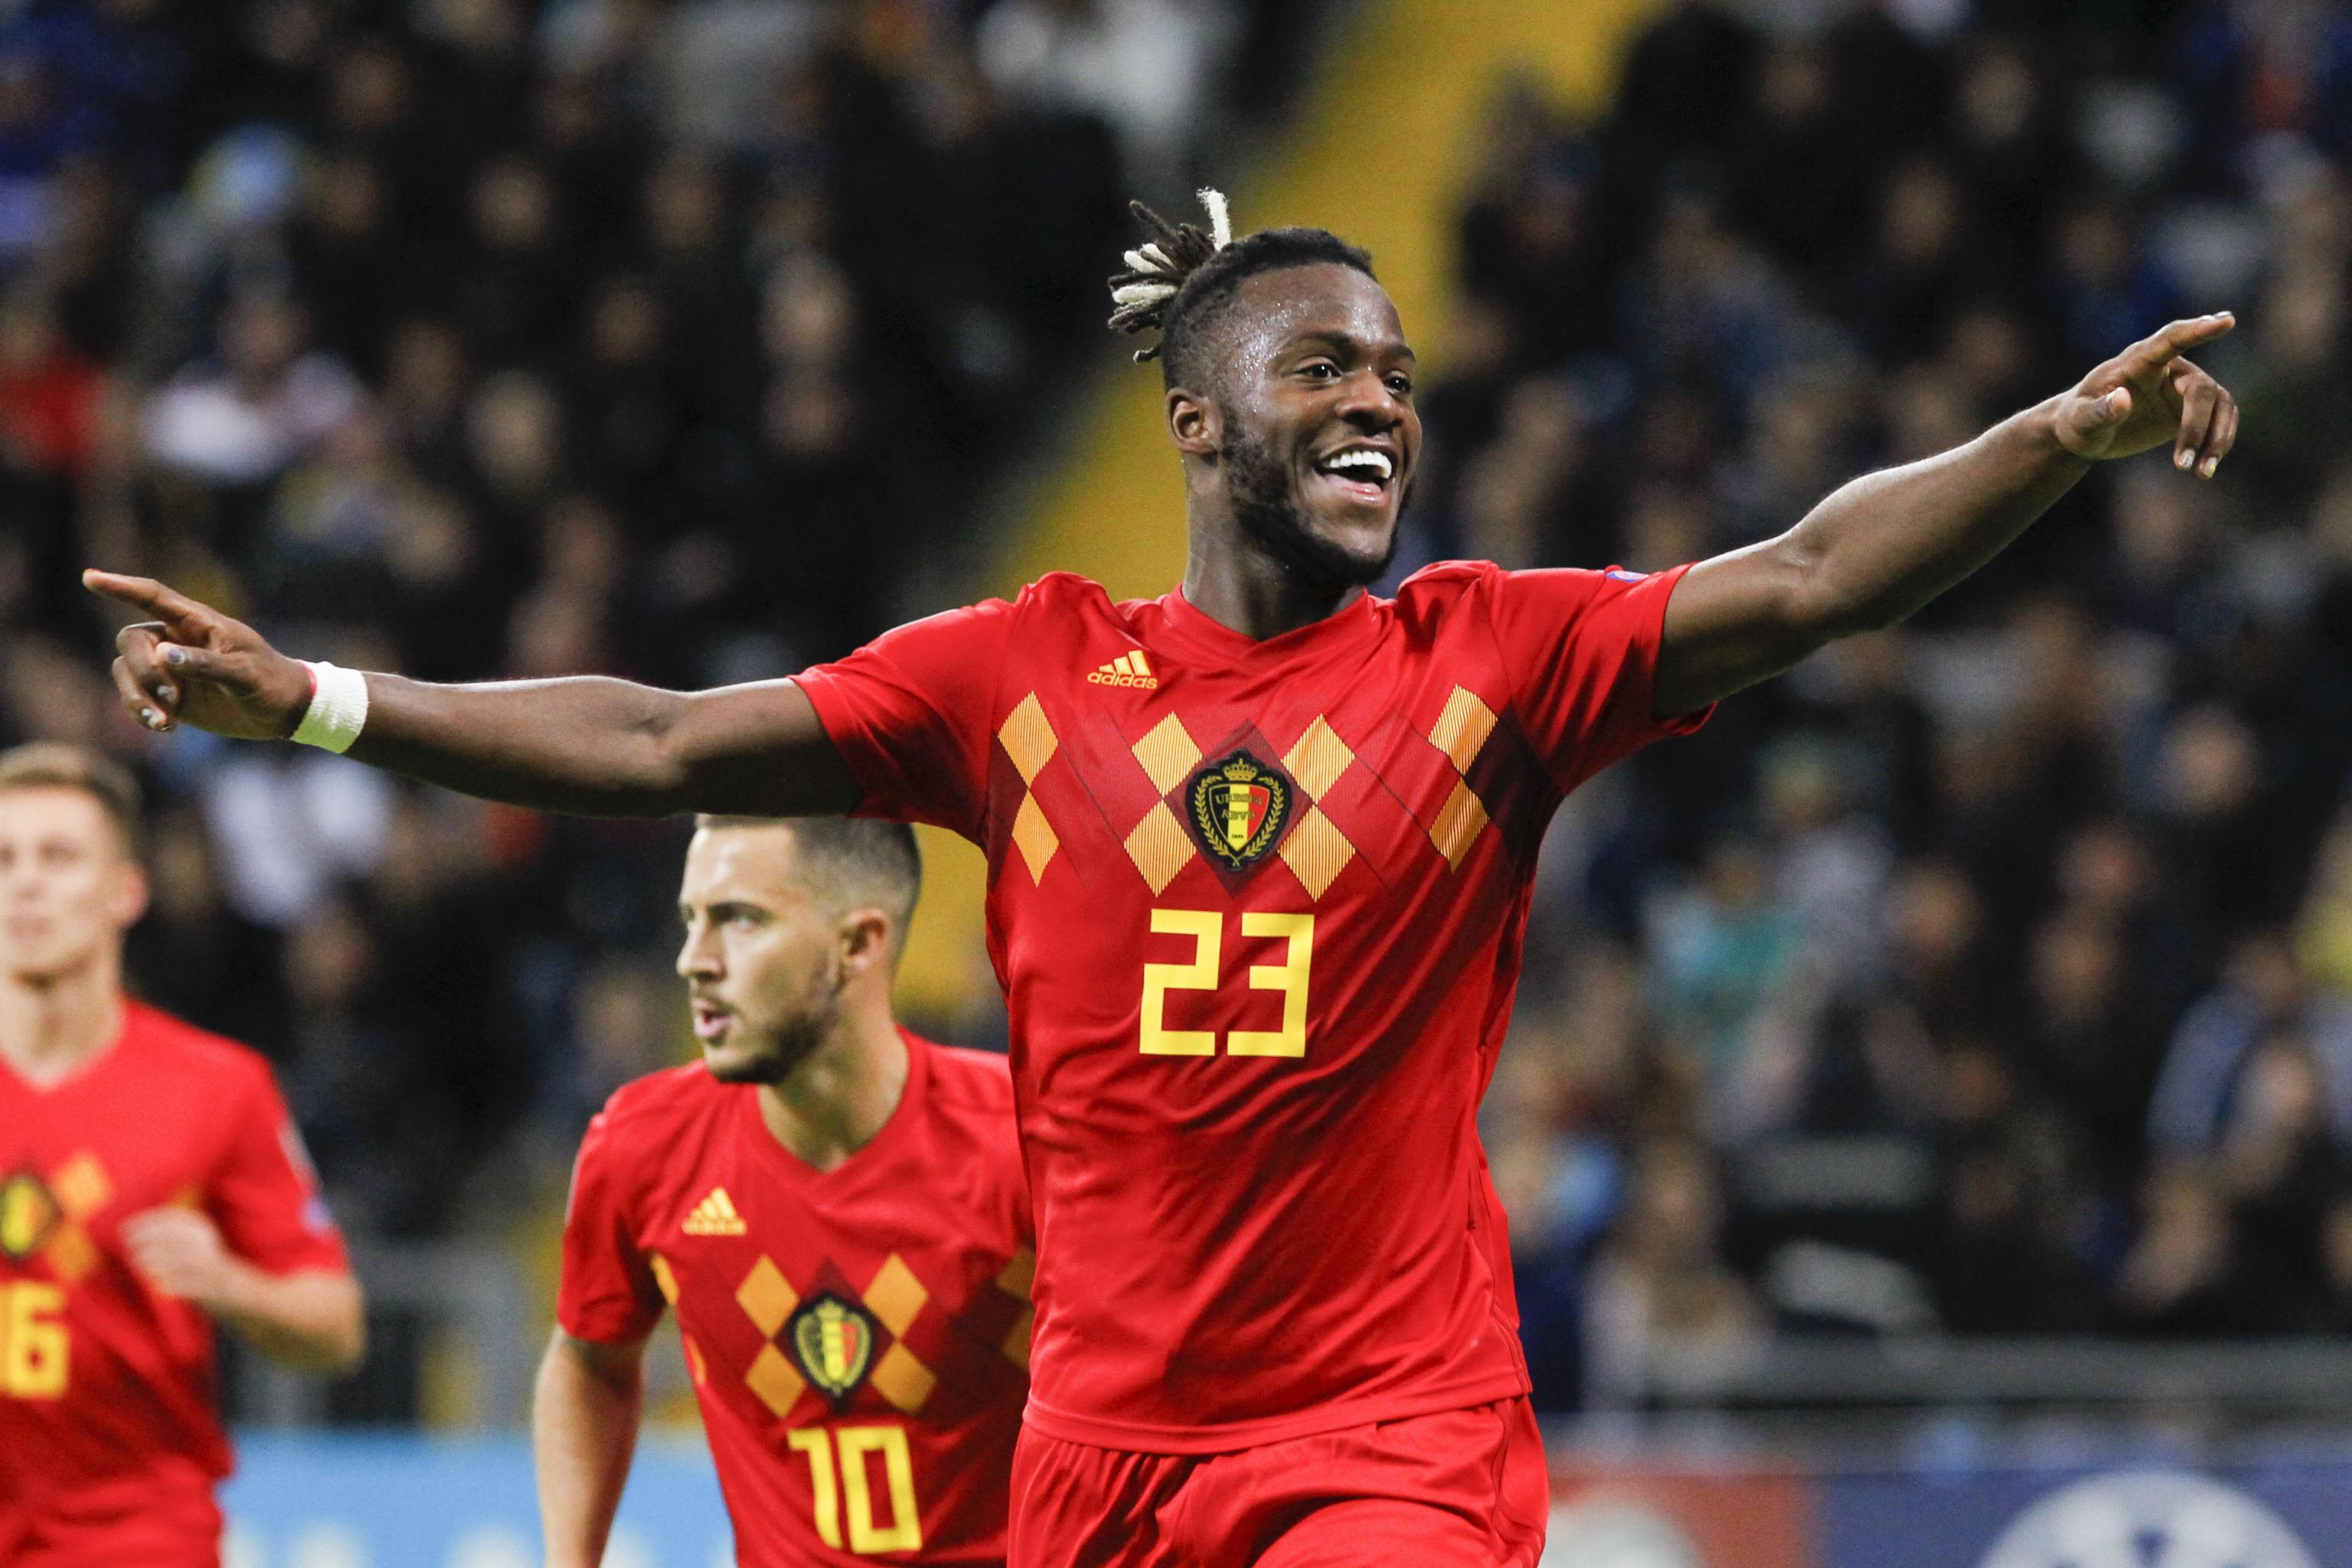 Michy Batshuayi Scores in Belgium's UEFA Euro 2020 Qualifying Win vs. Kazakhstan | Bleacher Report | Latest News, Videos and Highlights